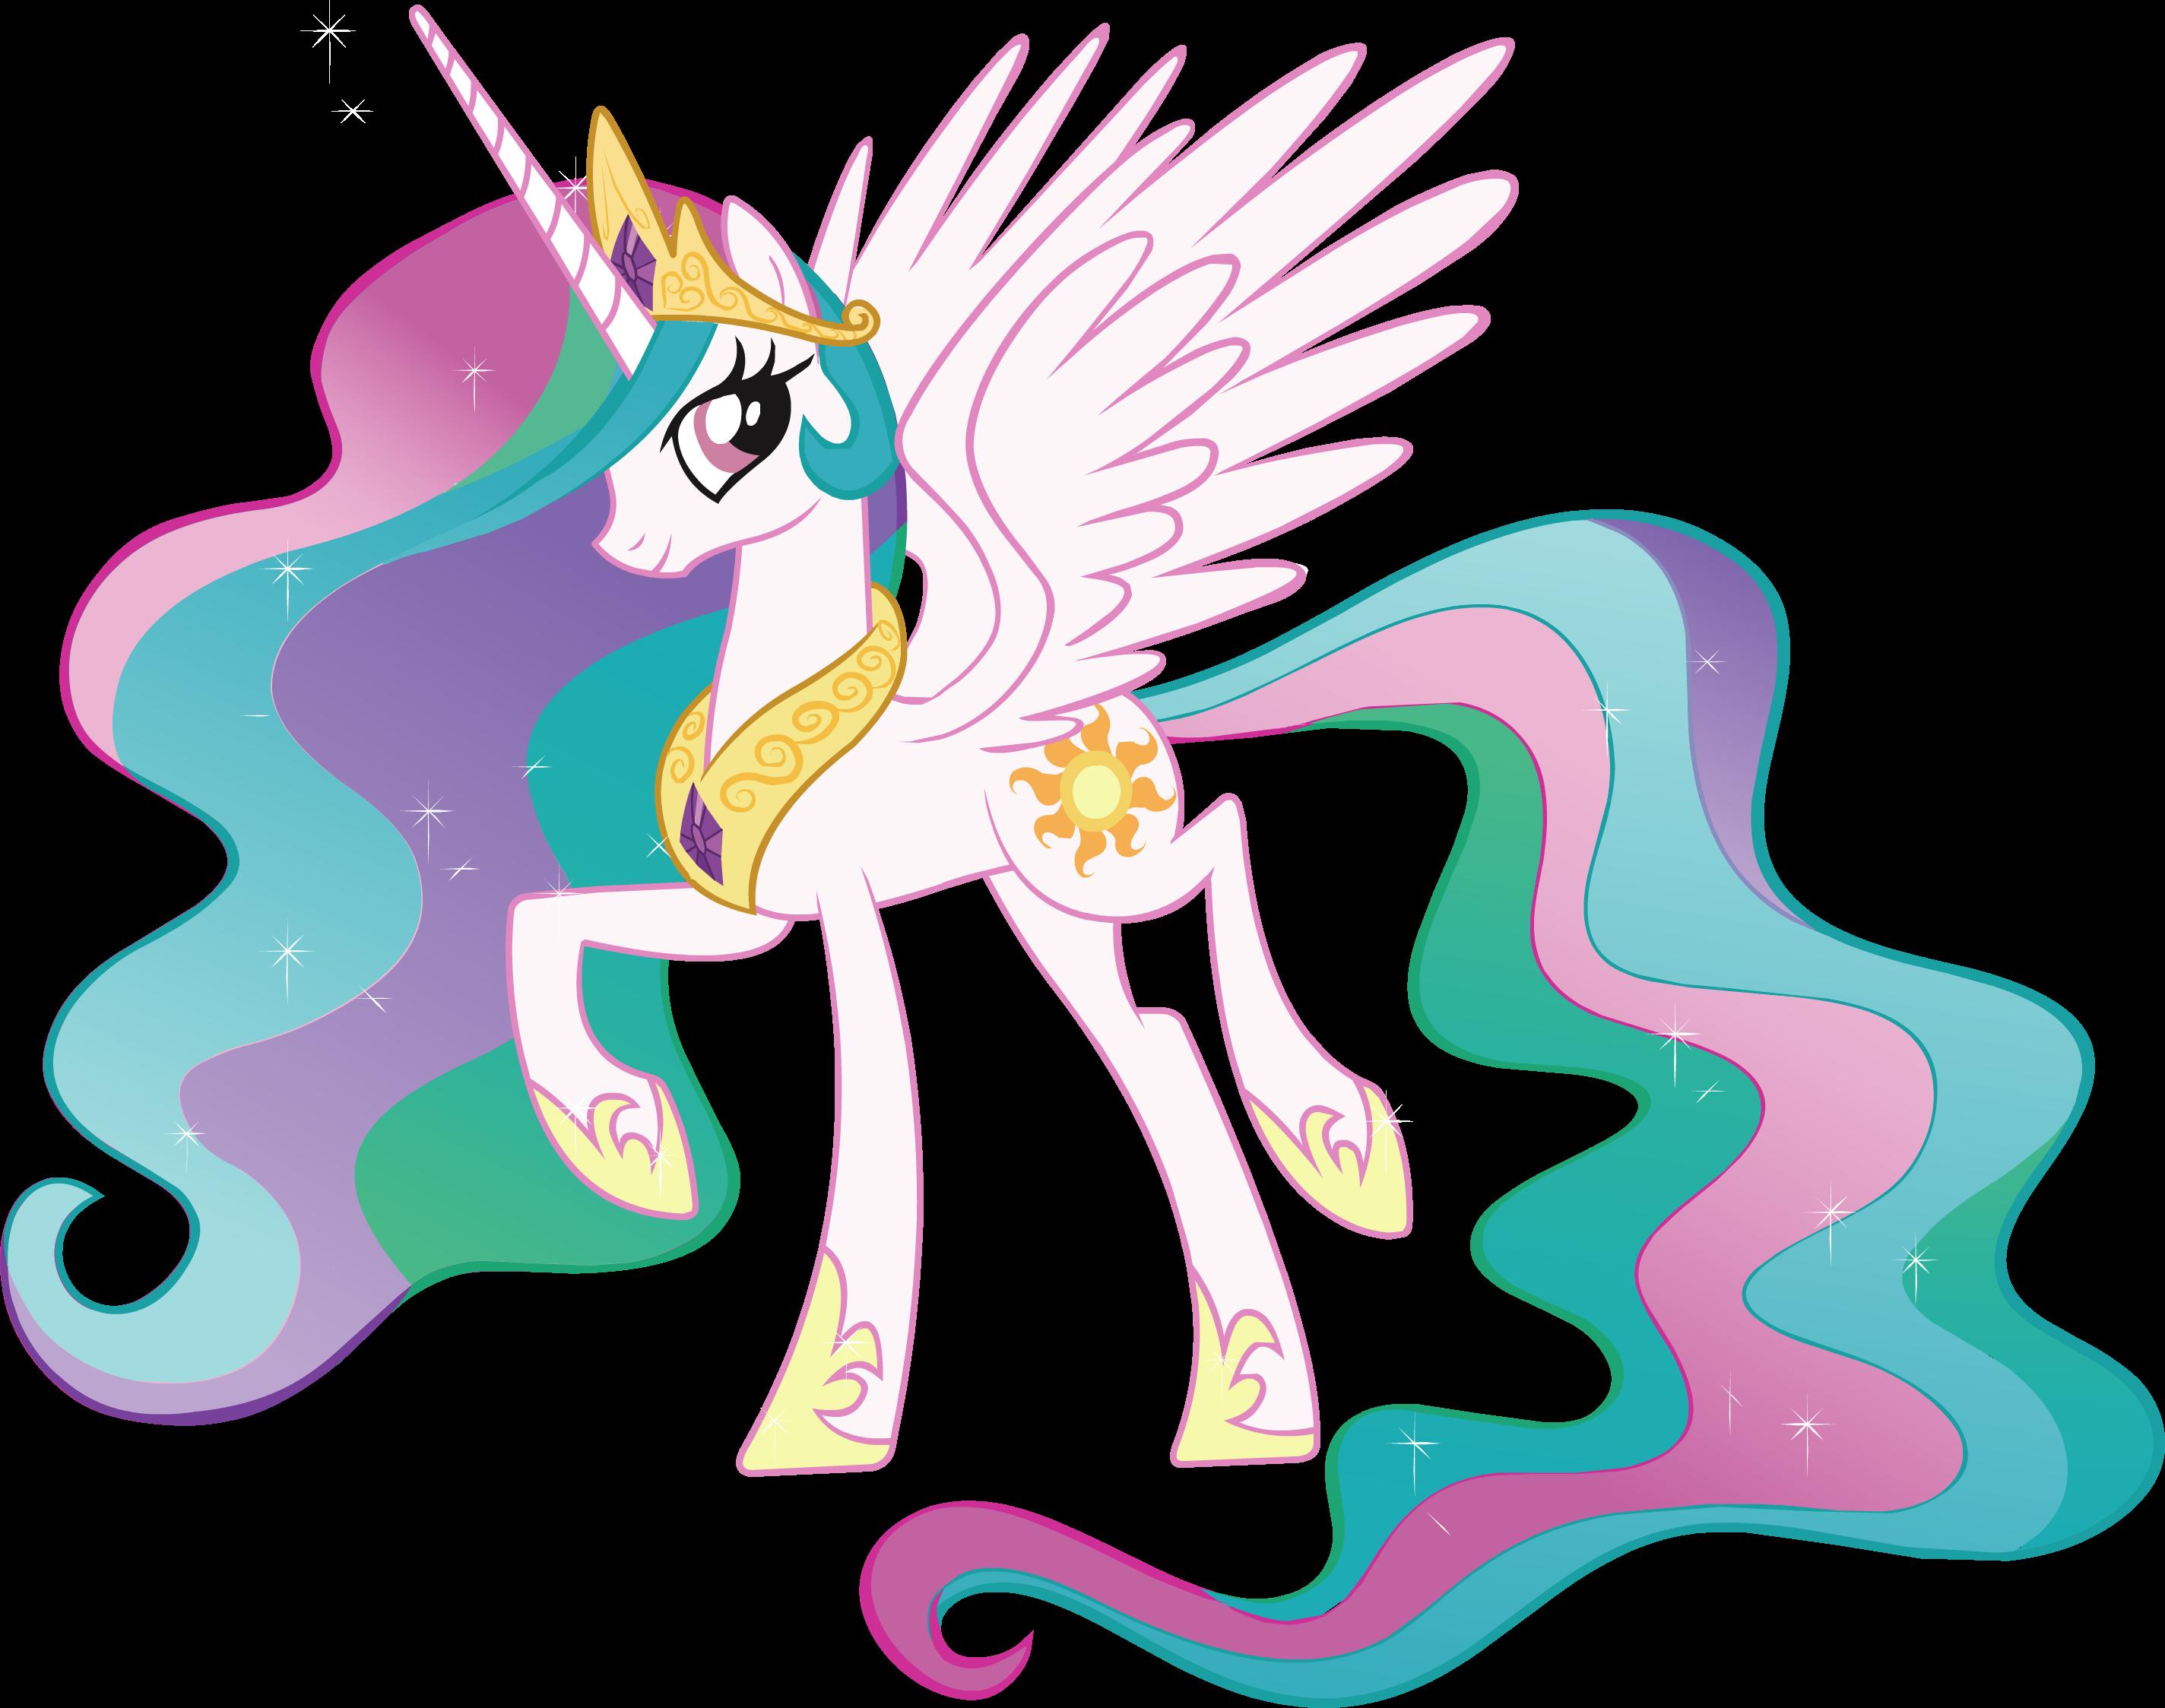 Princess Celestia 39 My Little Pony Friendship Is Magic 39 Unicorn Dreams Pinterest